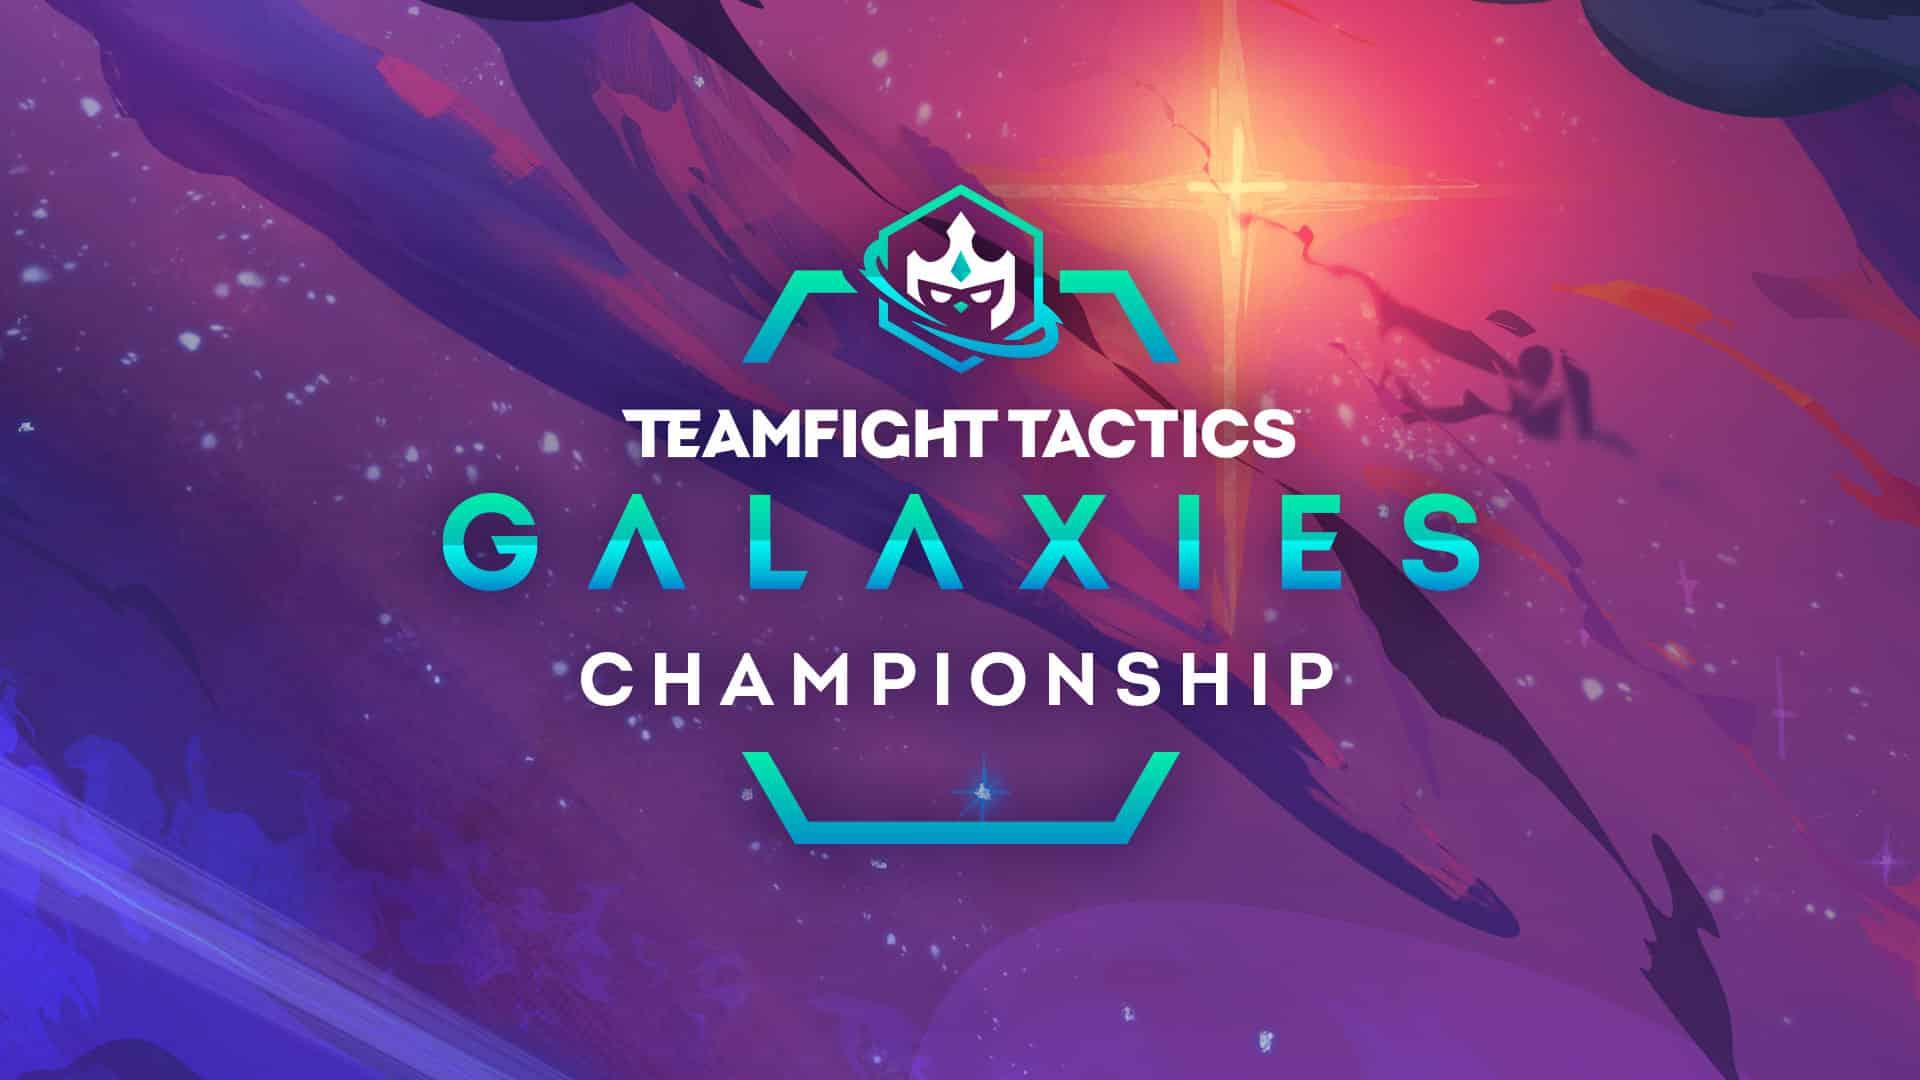 TFT Galaxies Championship Announcement Banner